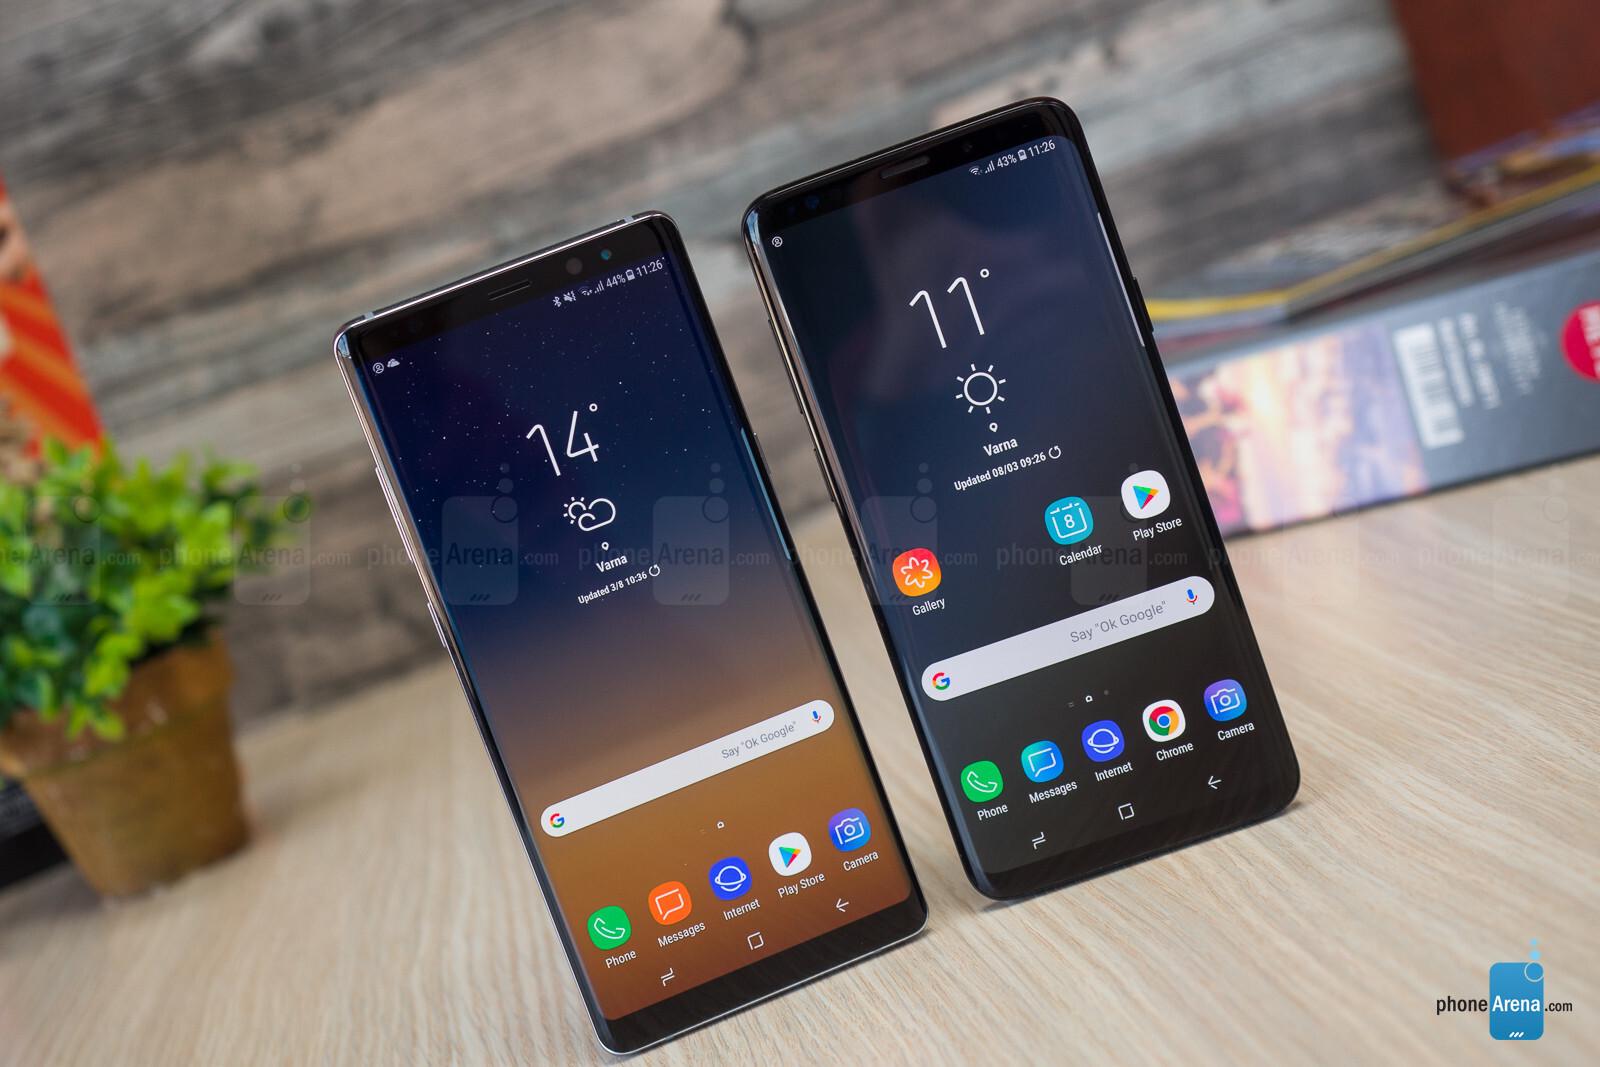 Samsung S9 Galaxy Note